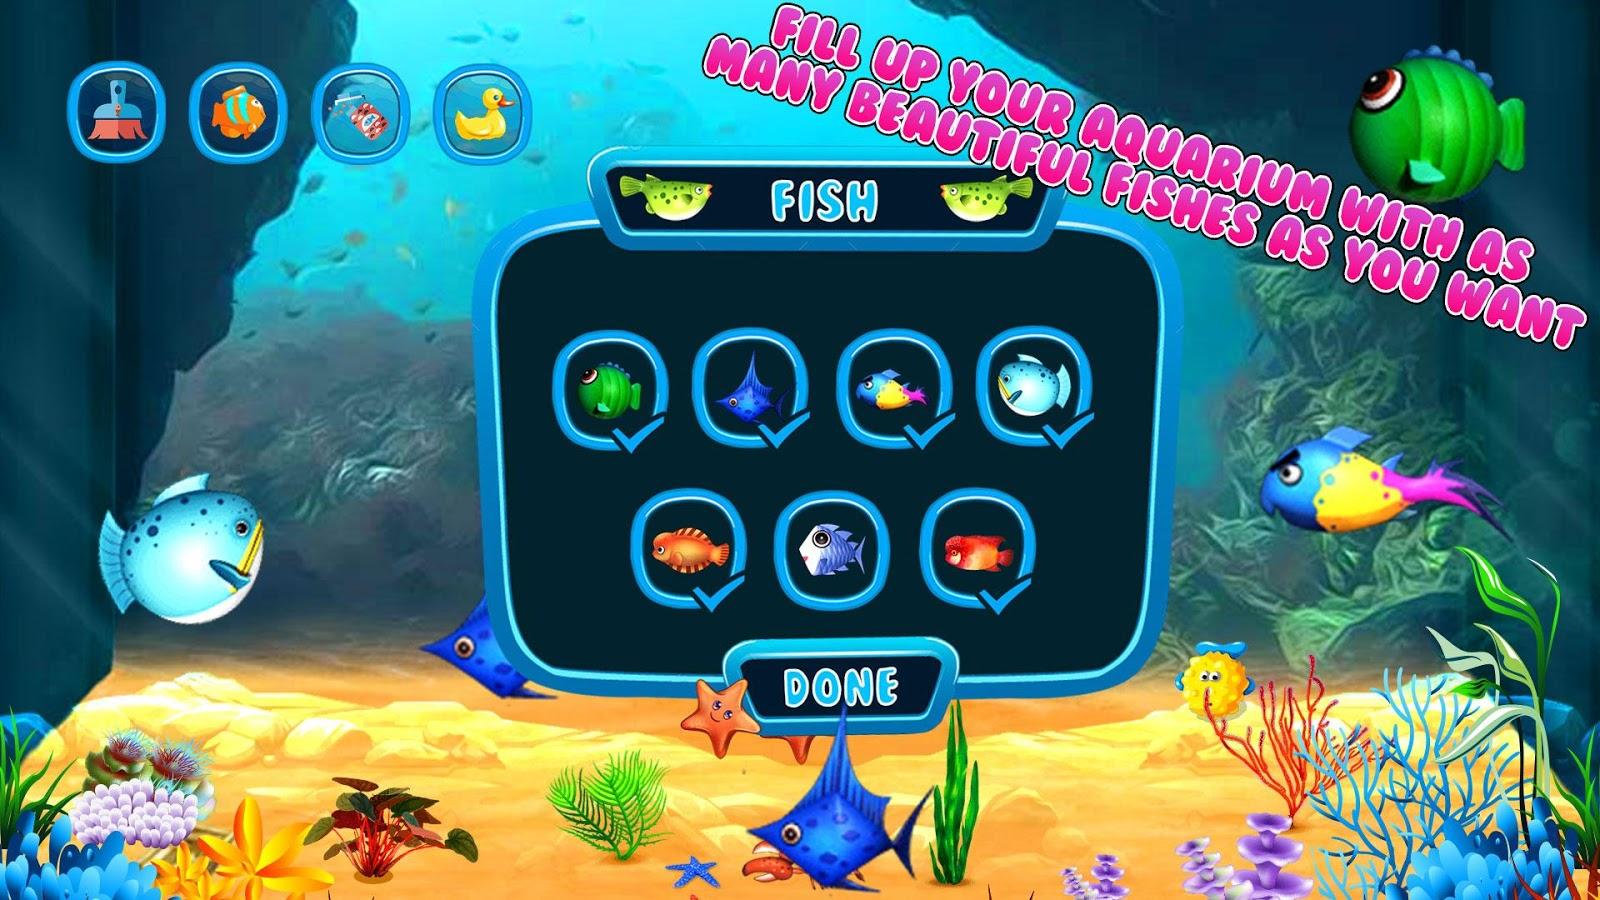 Fish aquarium business - My Fish Aquarium Fish Care Screenshot